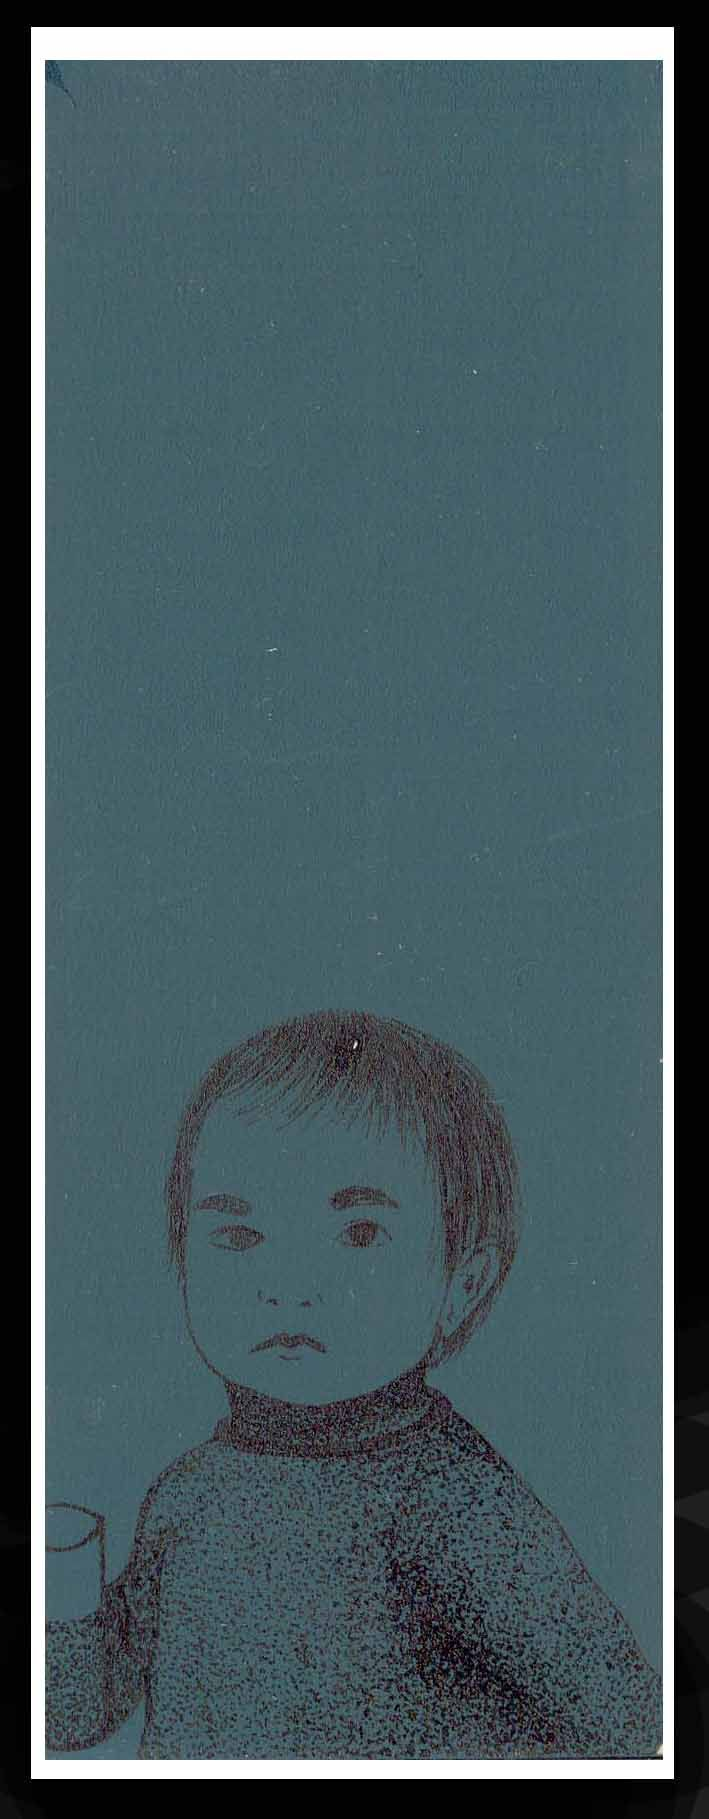 Serie Añoranzas. Tinta china sobre madera